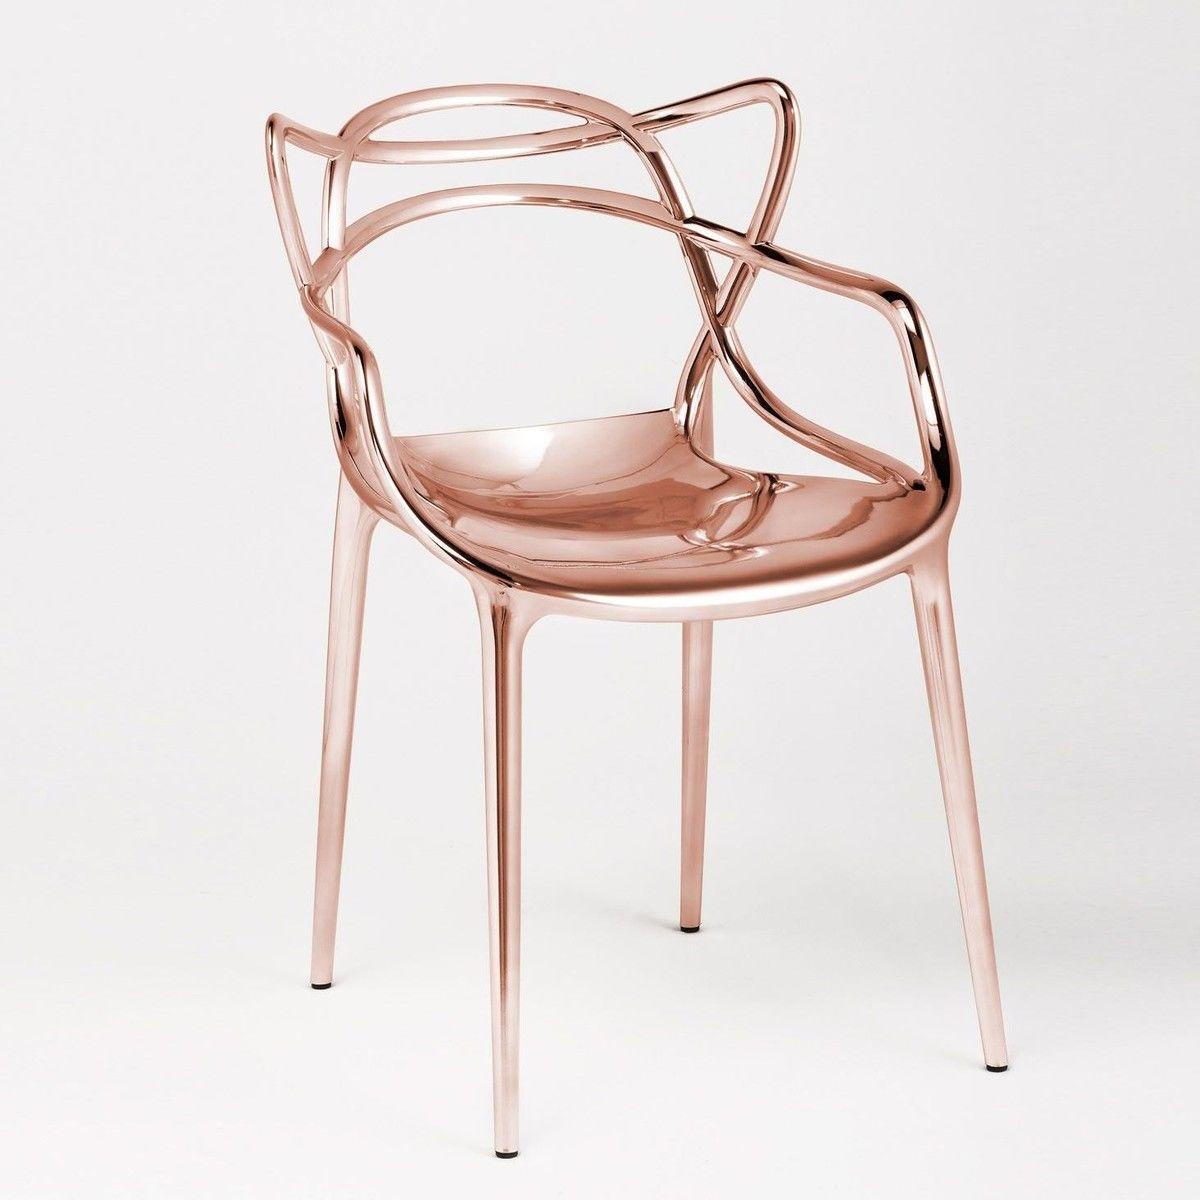 chaises kartell pas cher latest philippe stark chaise victoria ghost with chaises kartell pas. Black Bedroom Furniture Sets. Home Design Ideas